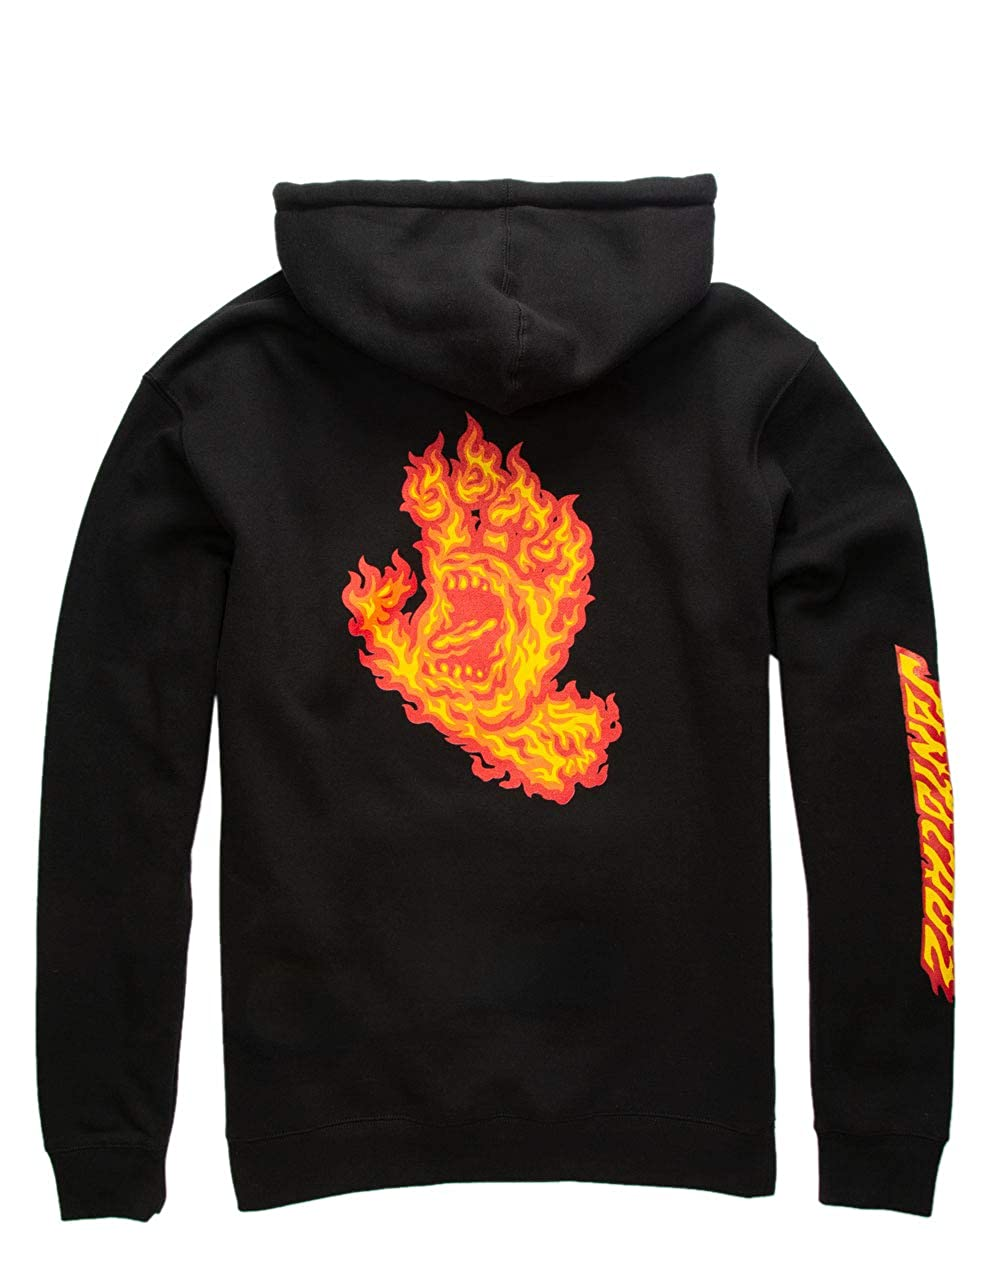 XL Black Santa Cruz Flame Hand Hoodie